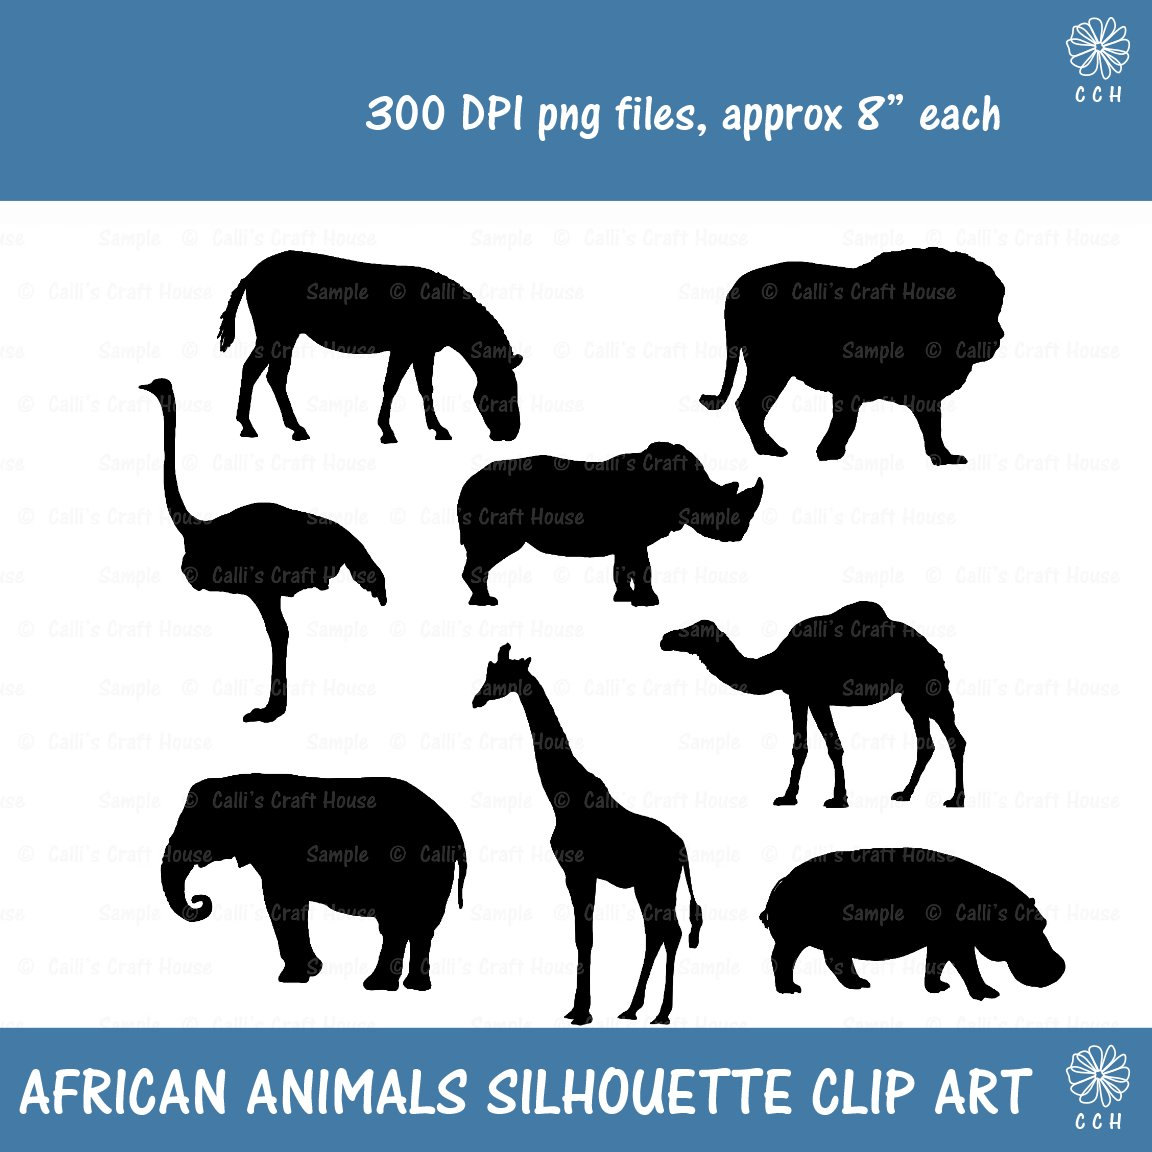 Rhino clipart african animal #3